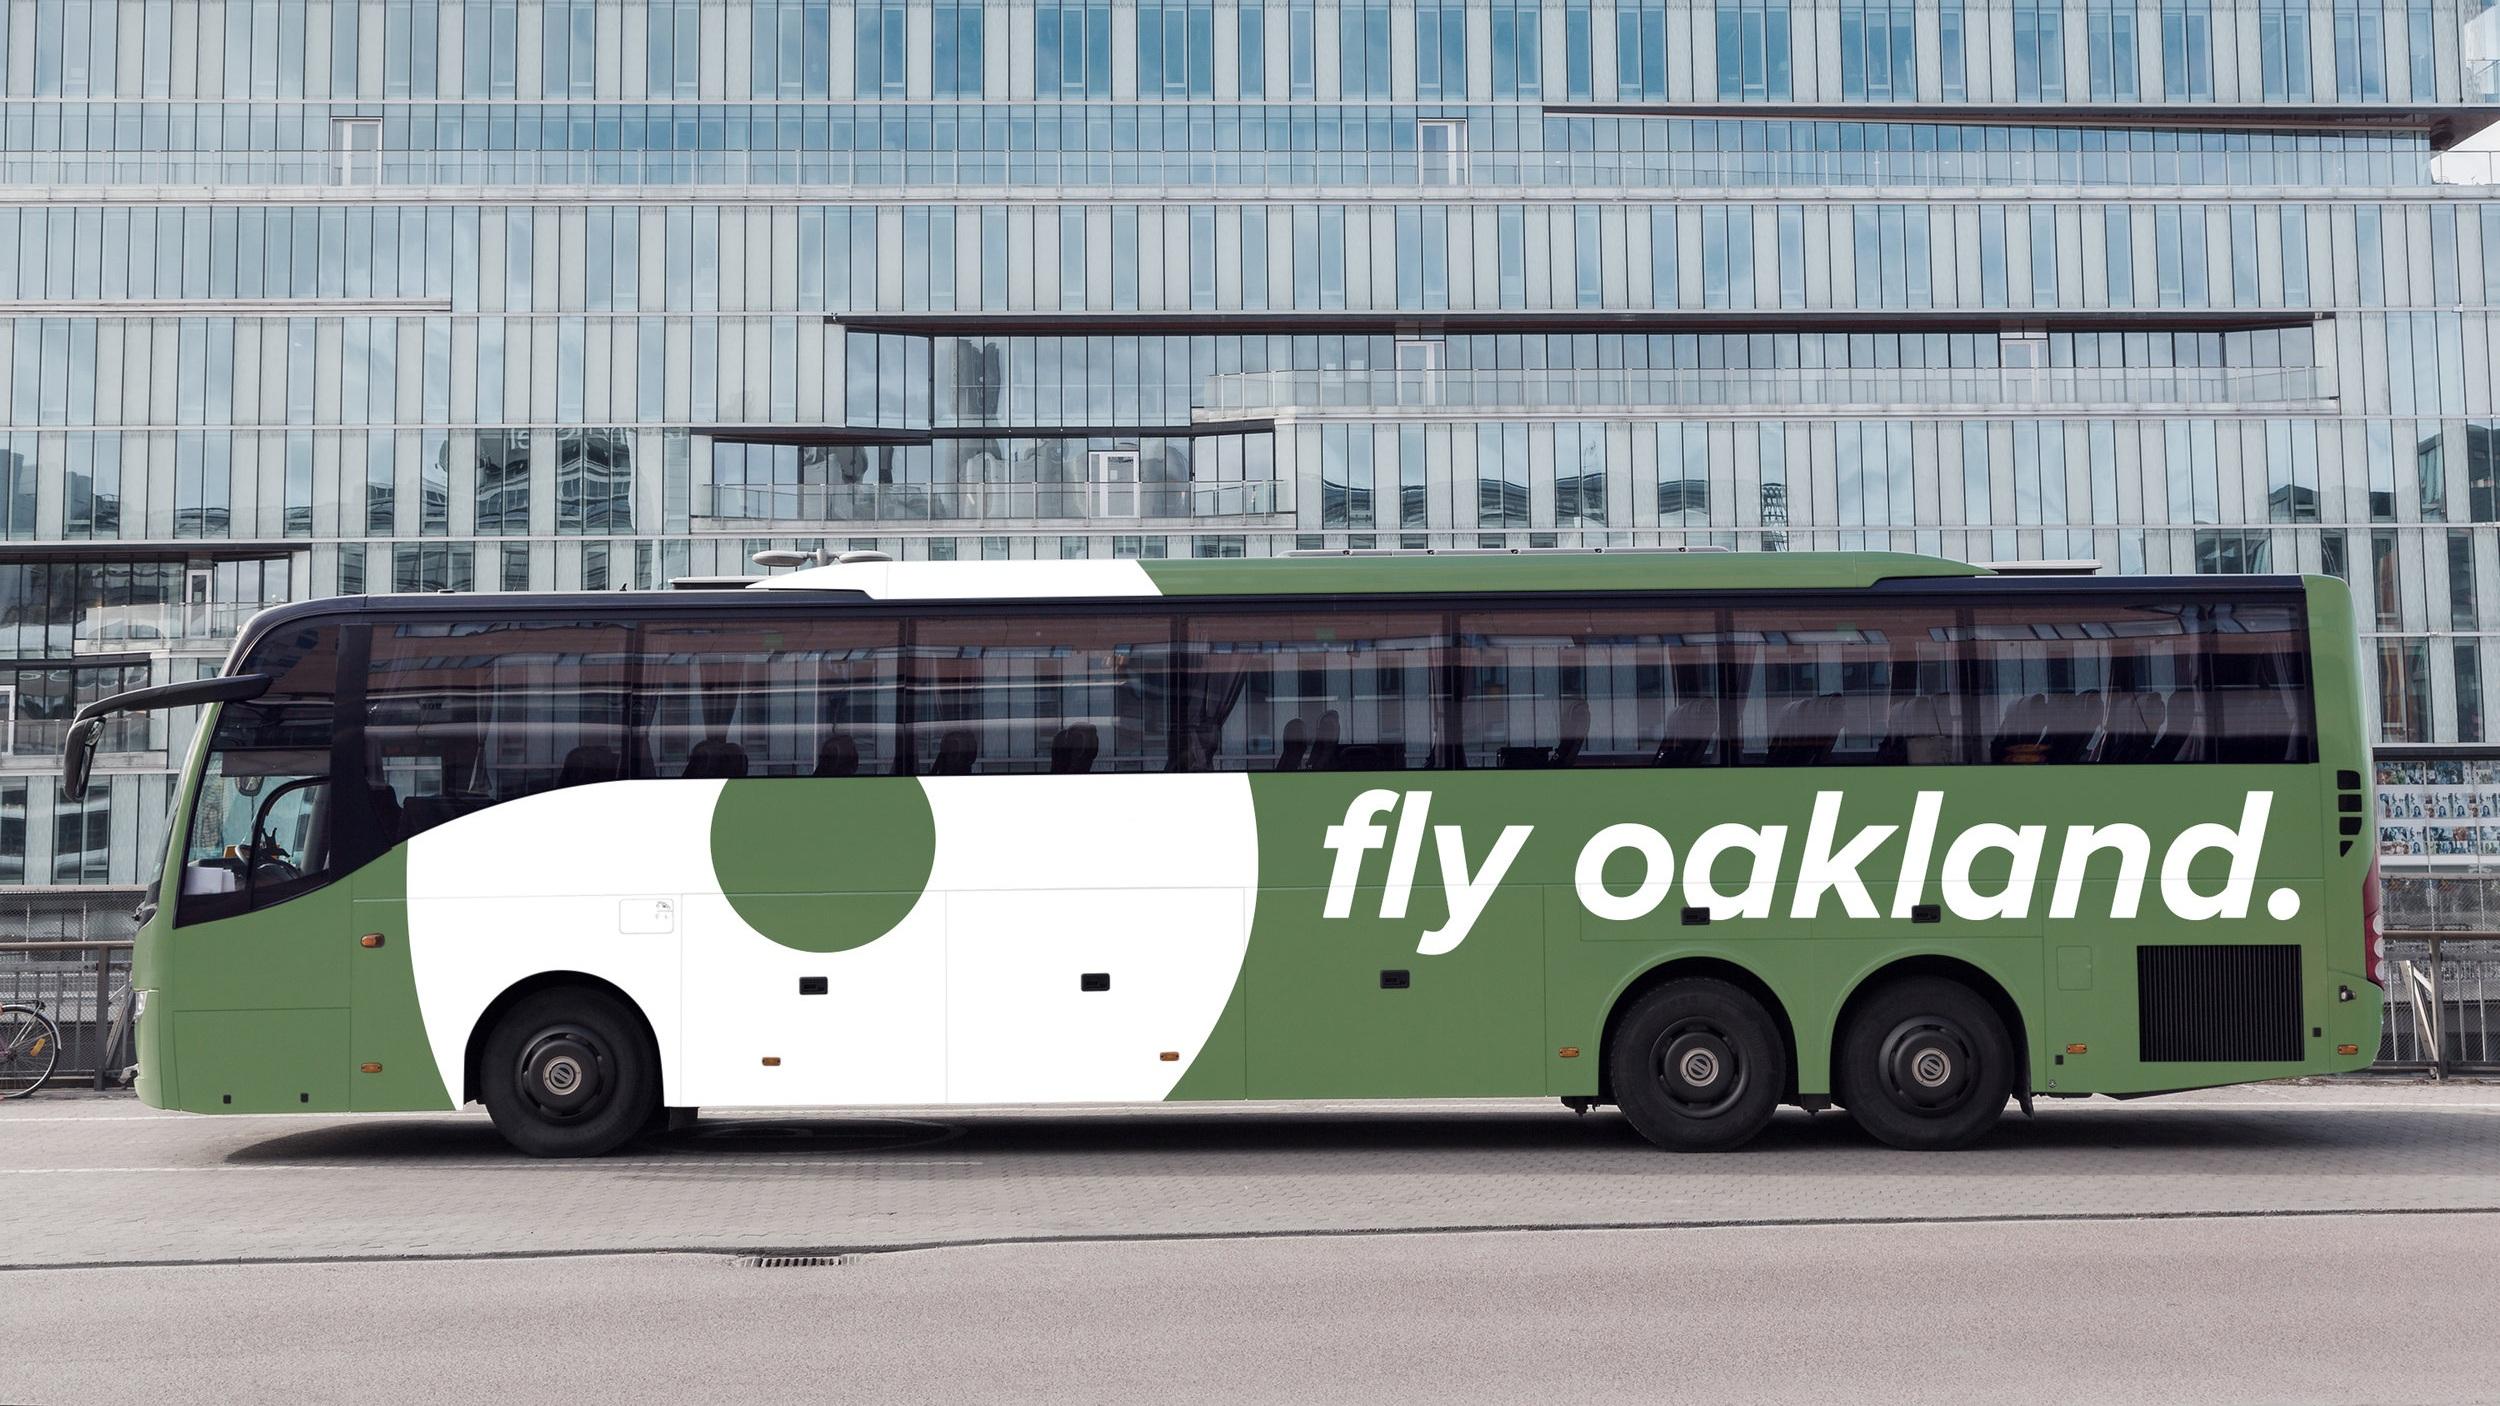 Bus+Green+Fly+Oakland+Period.jpg